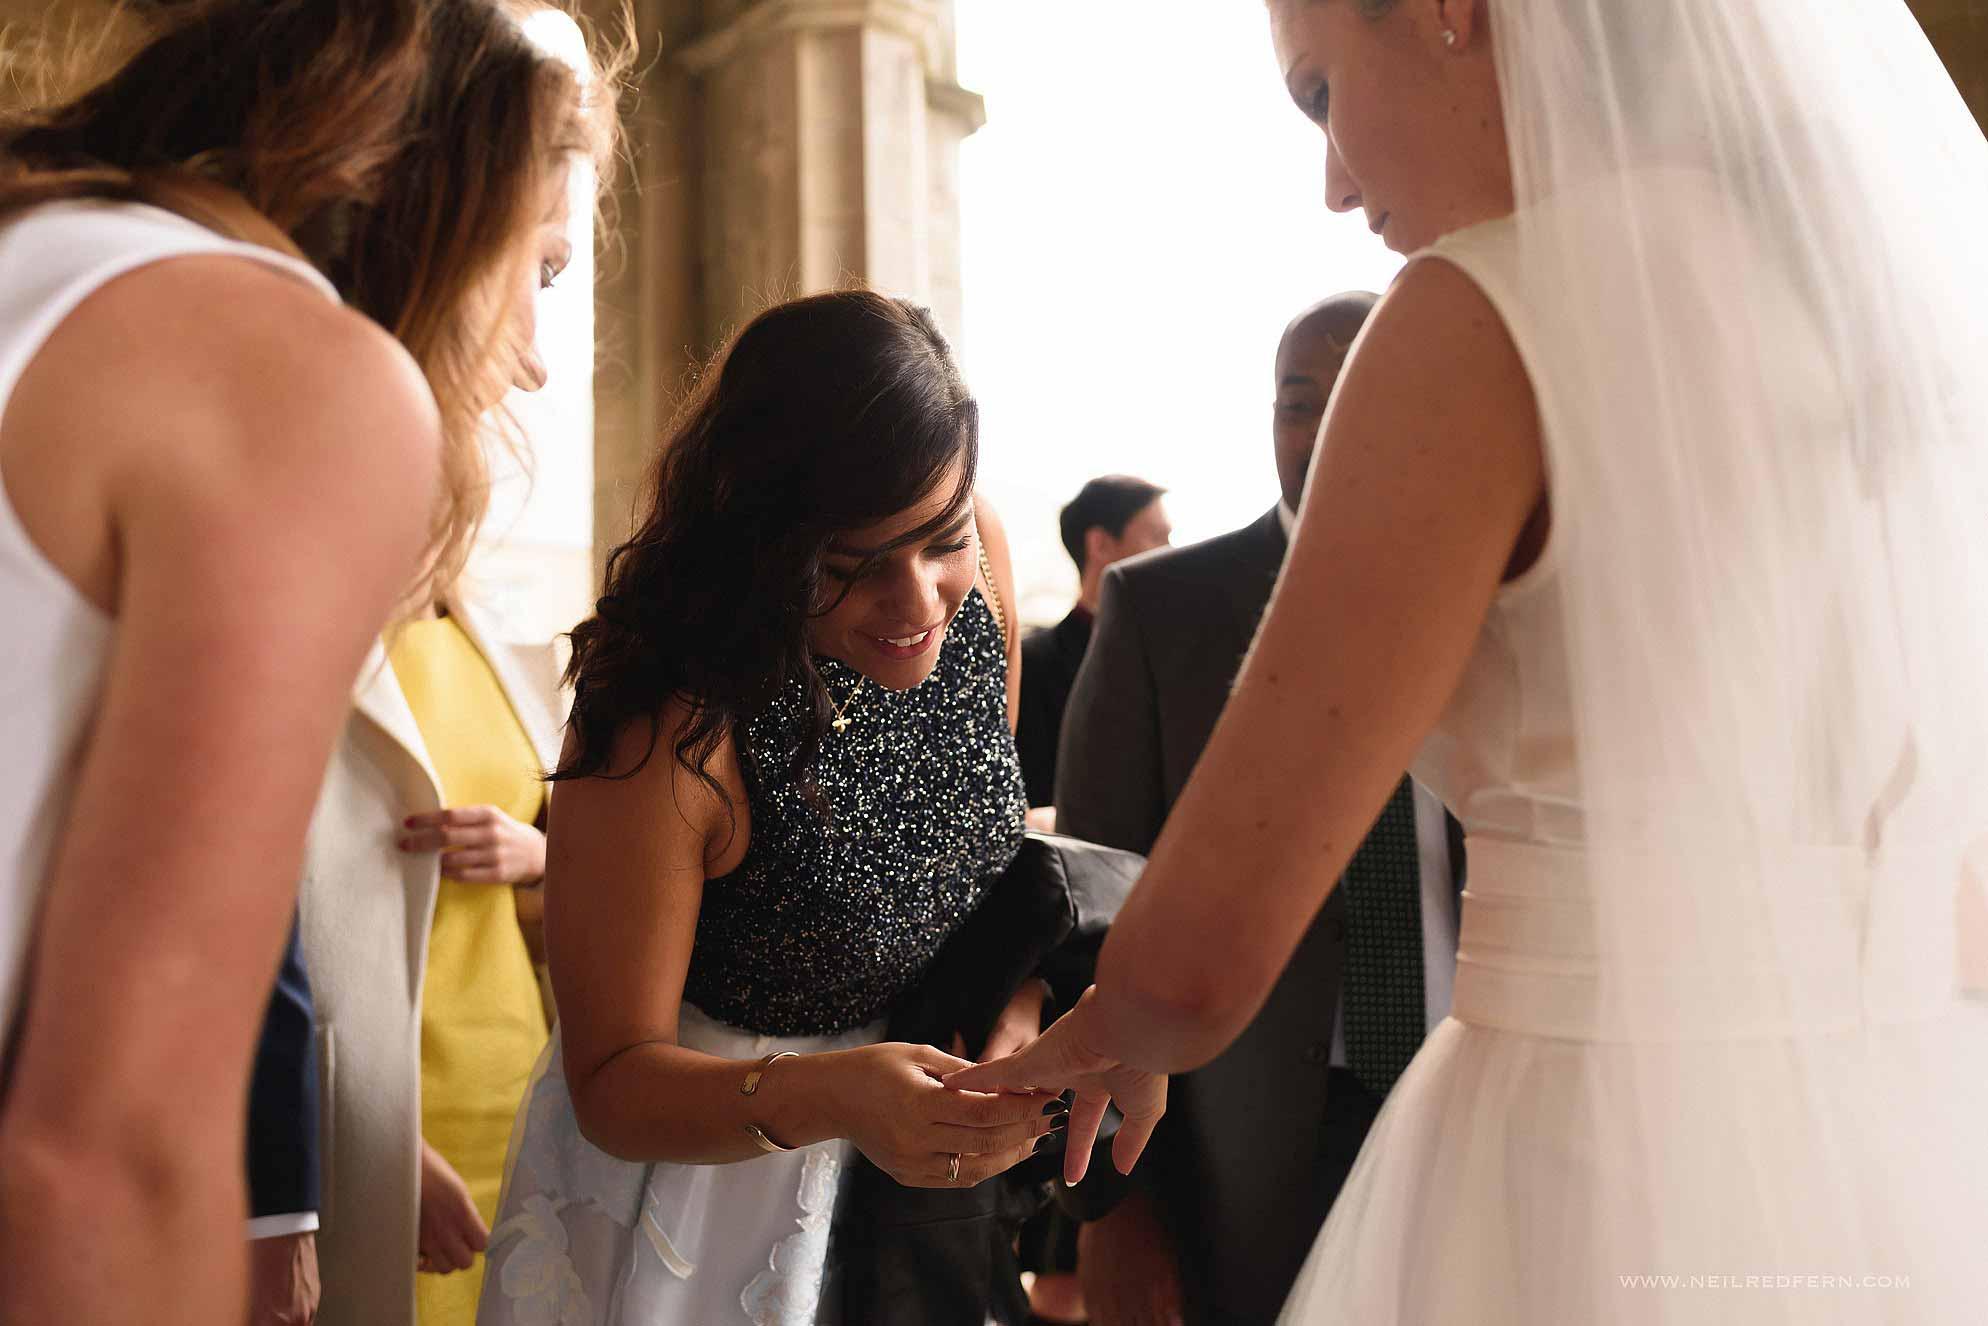 st-andrews-wedding-photograph-16